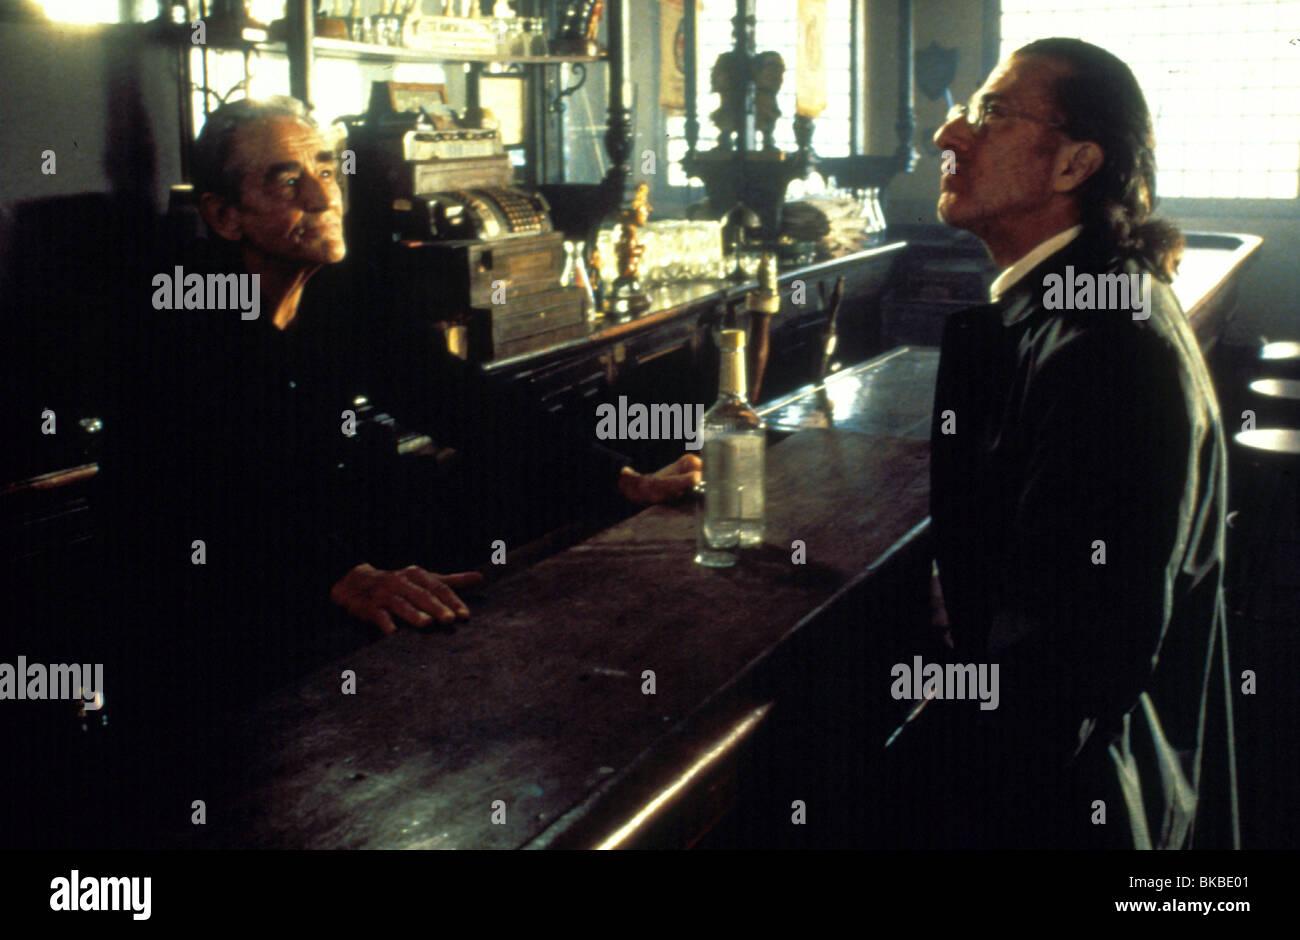 SLEEPERS (1996) VITTORIO GASSMAN, DUSTIN HOFFMAN SLPR 011 D - Stock Image